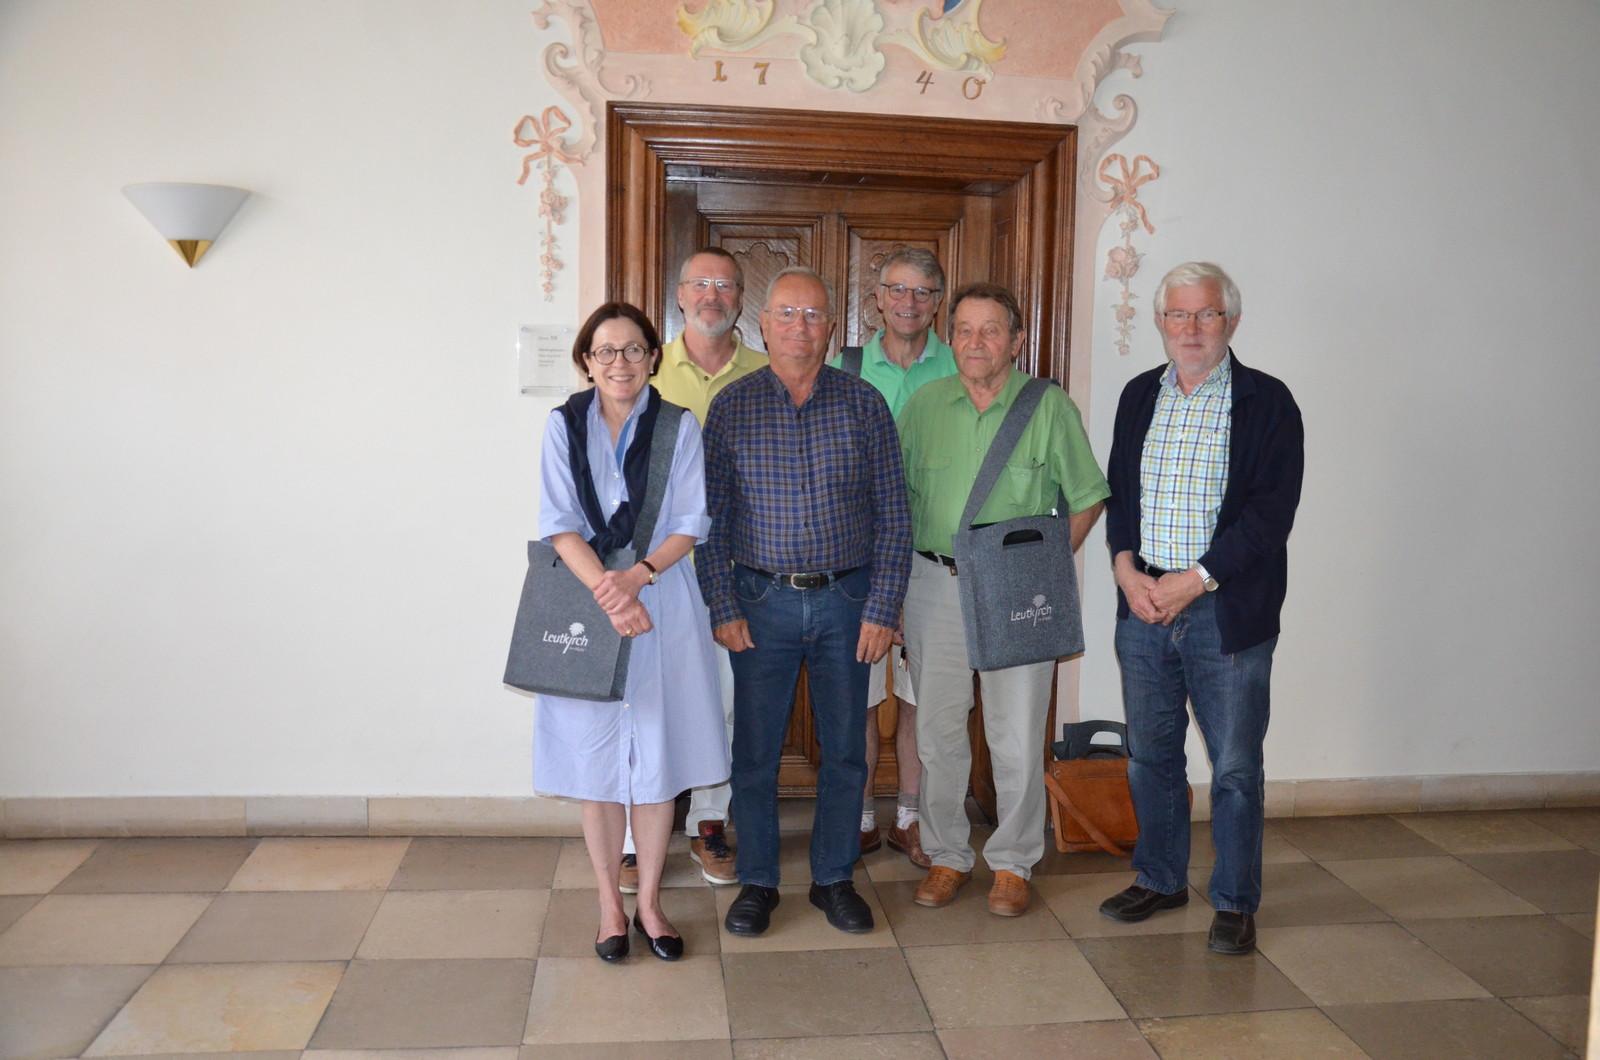 Das Team der Stadtführer: Dr. Alexandra Fesseler, Claudio Uptmoor, Hartmut Stiegler, Herbert Kühnbach, Emil Hösch, Prof. Manfred Thierer (von links)